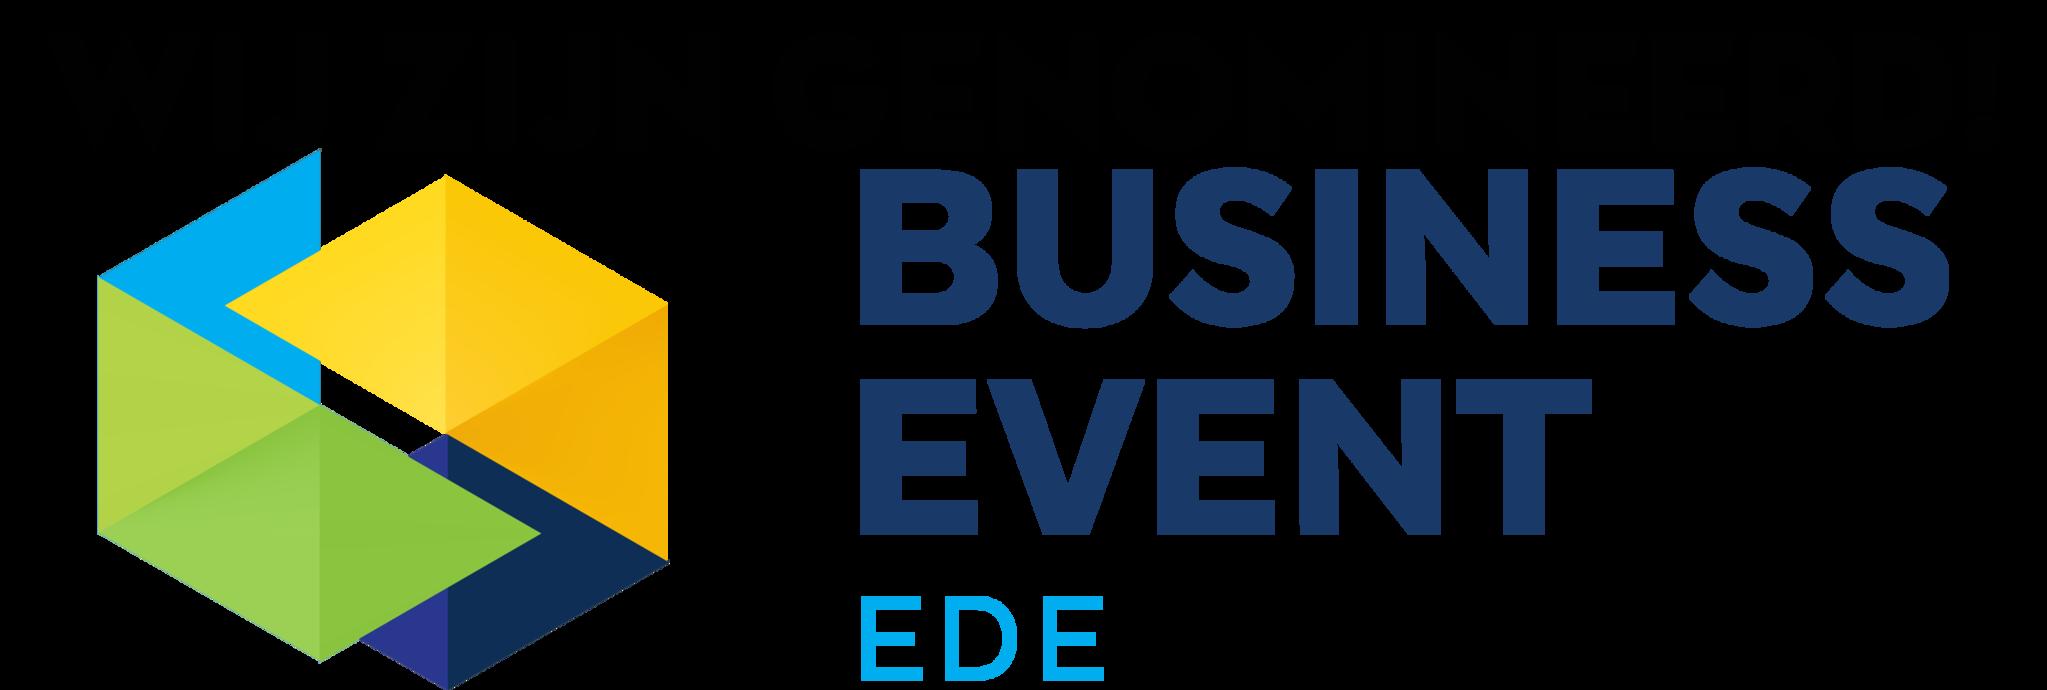 Business Event Ede